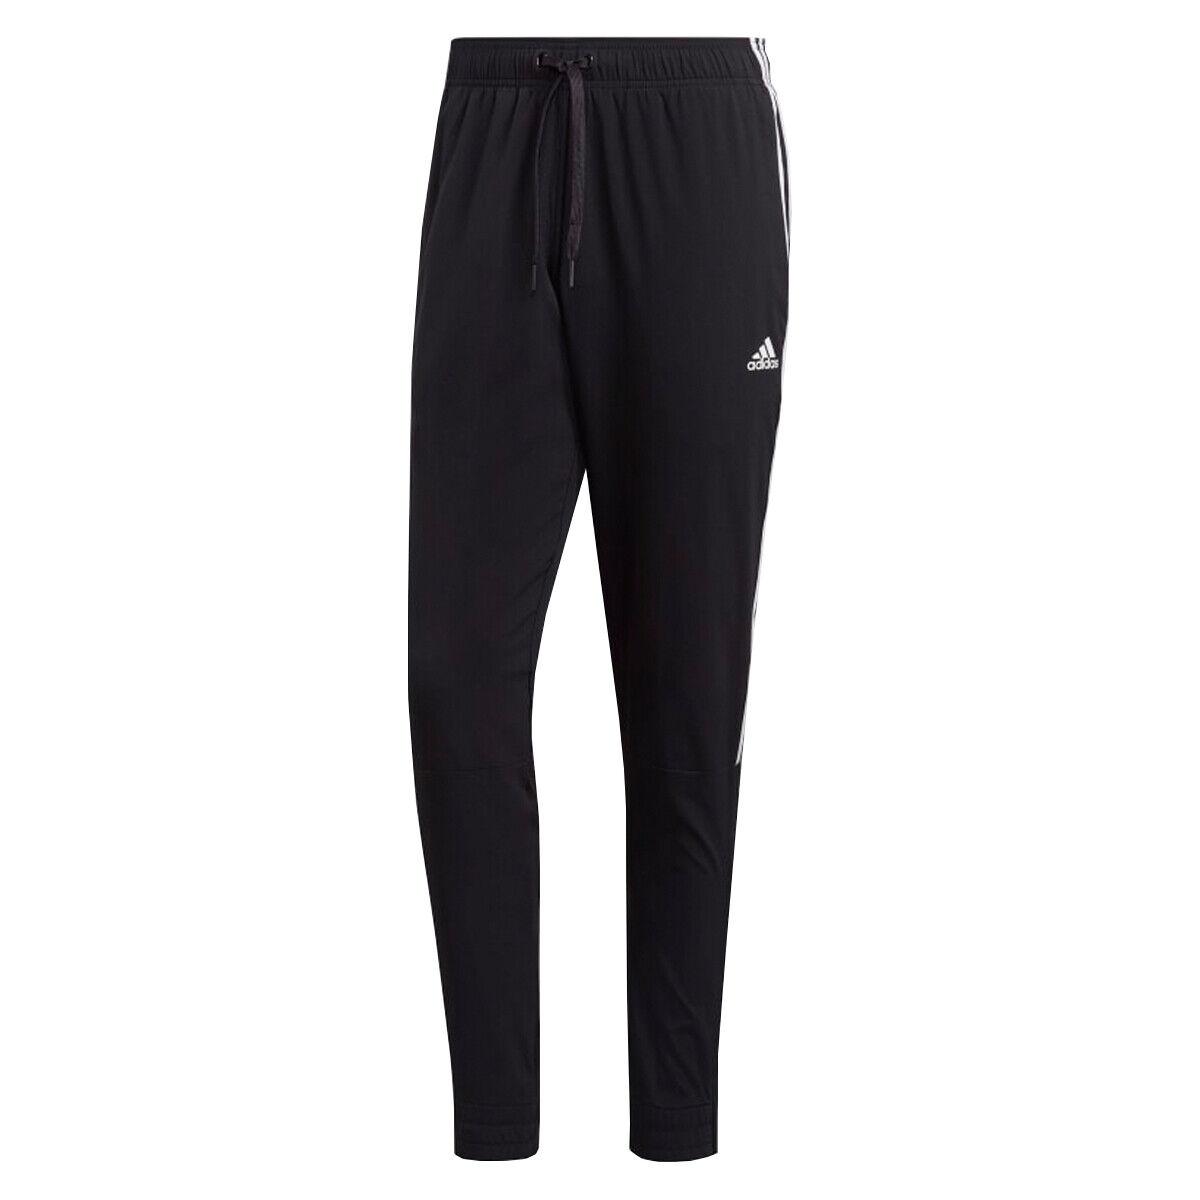 sport id tiro woven men s pants